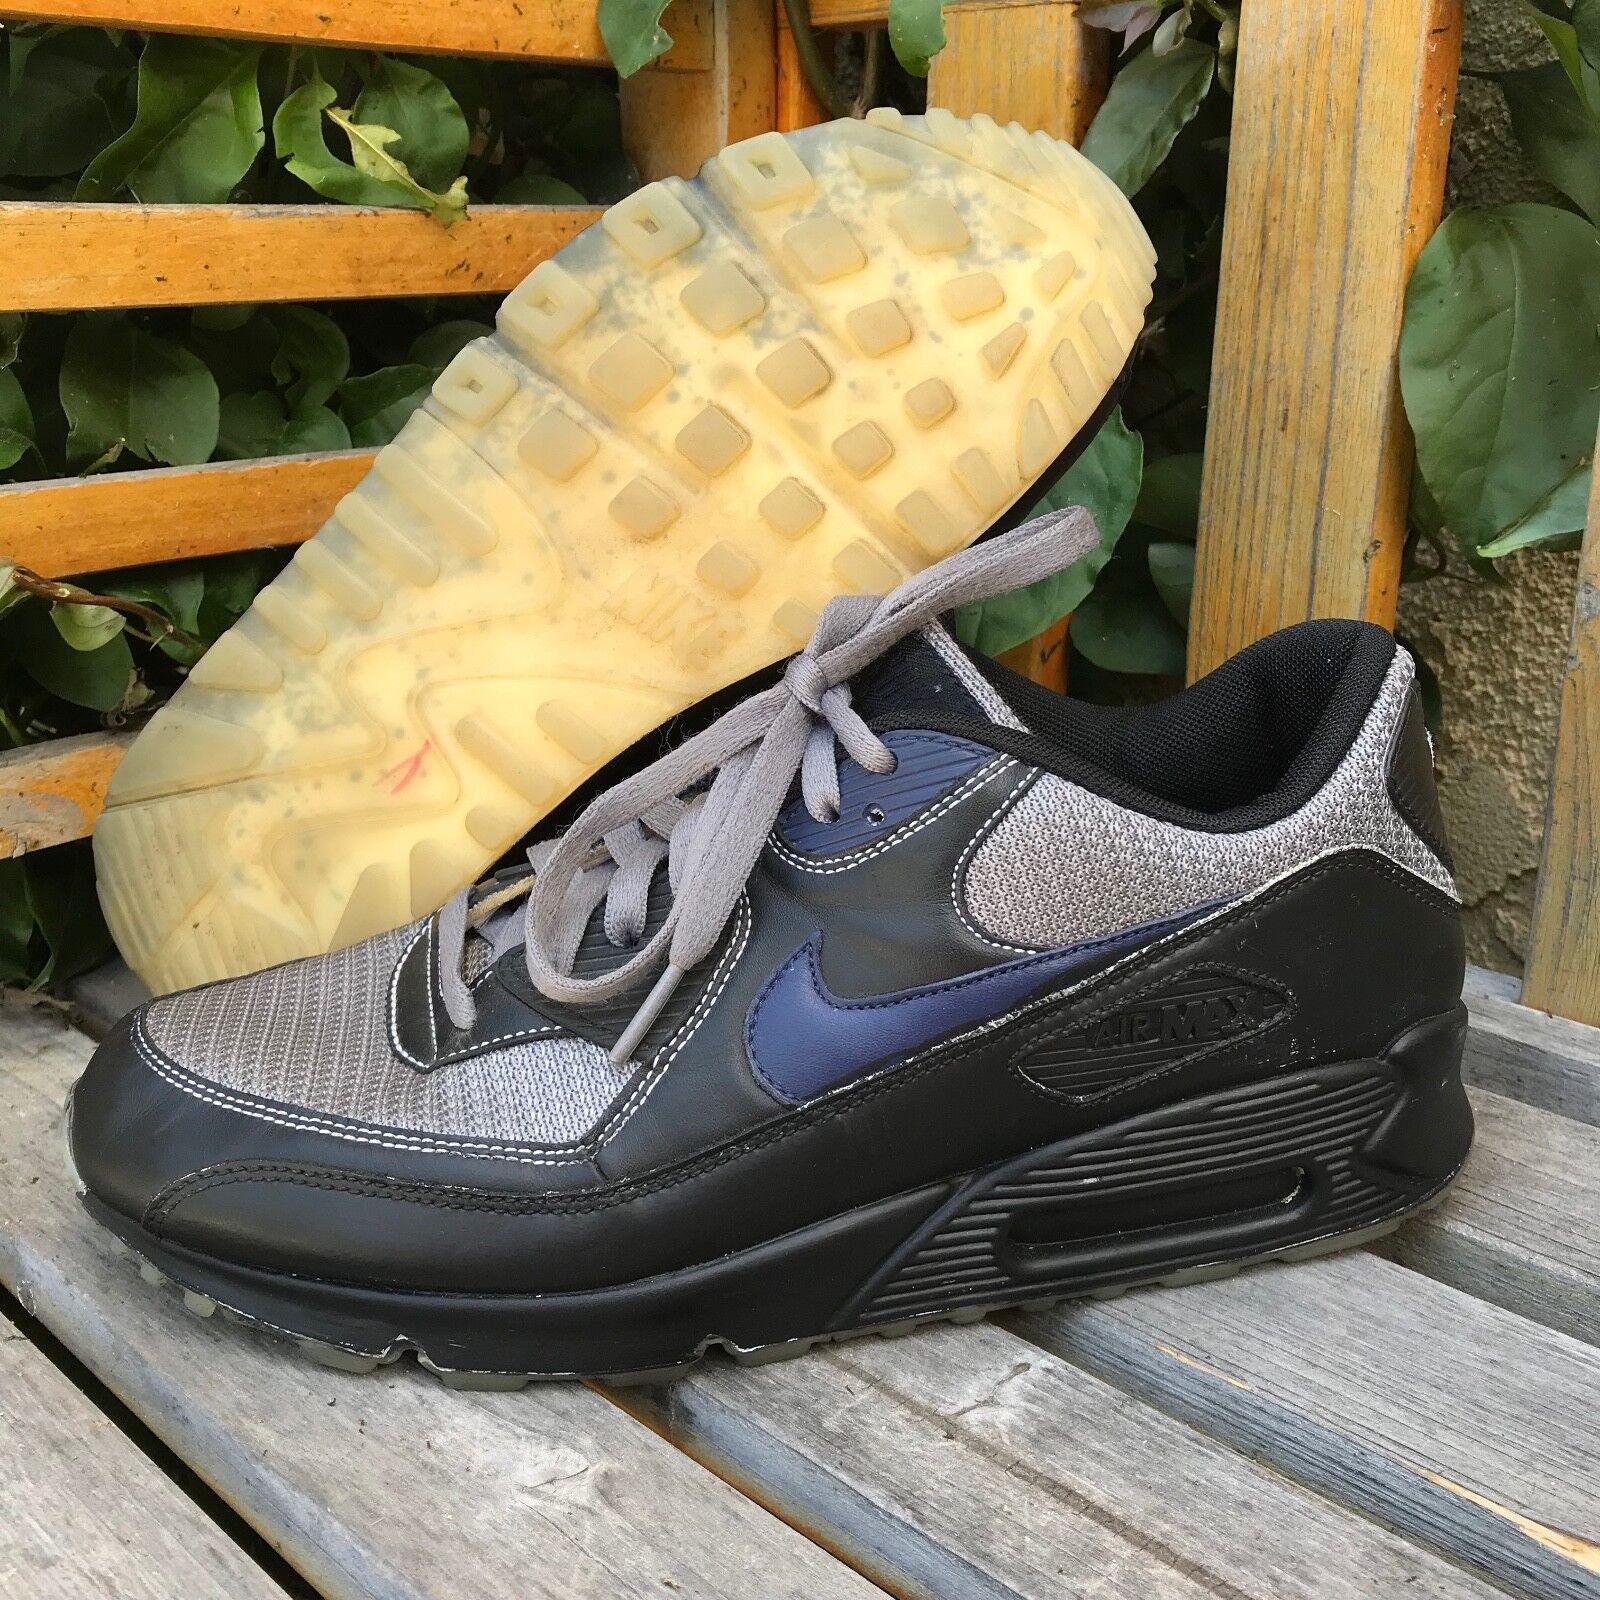 "NIKEiD Nike Air Max Custom ""West Coast"" Black Sneakers - Comfortable"